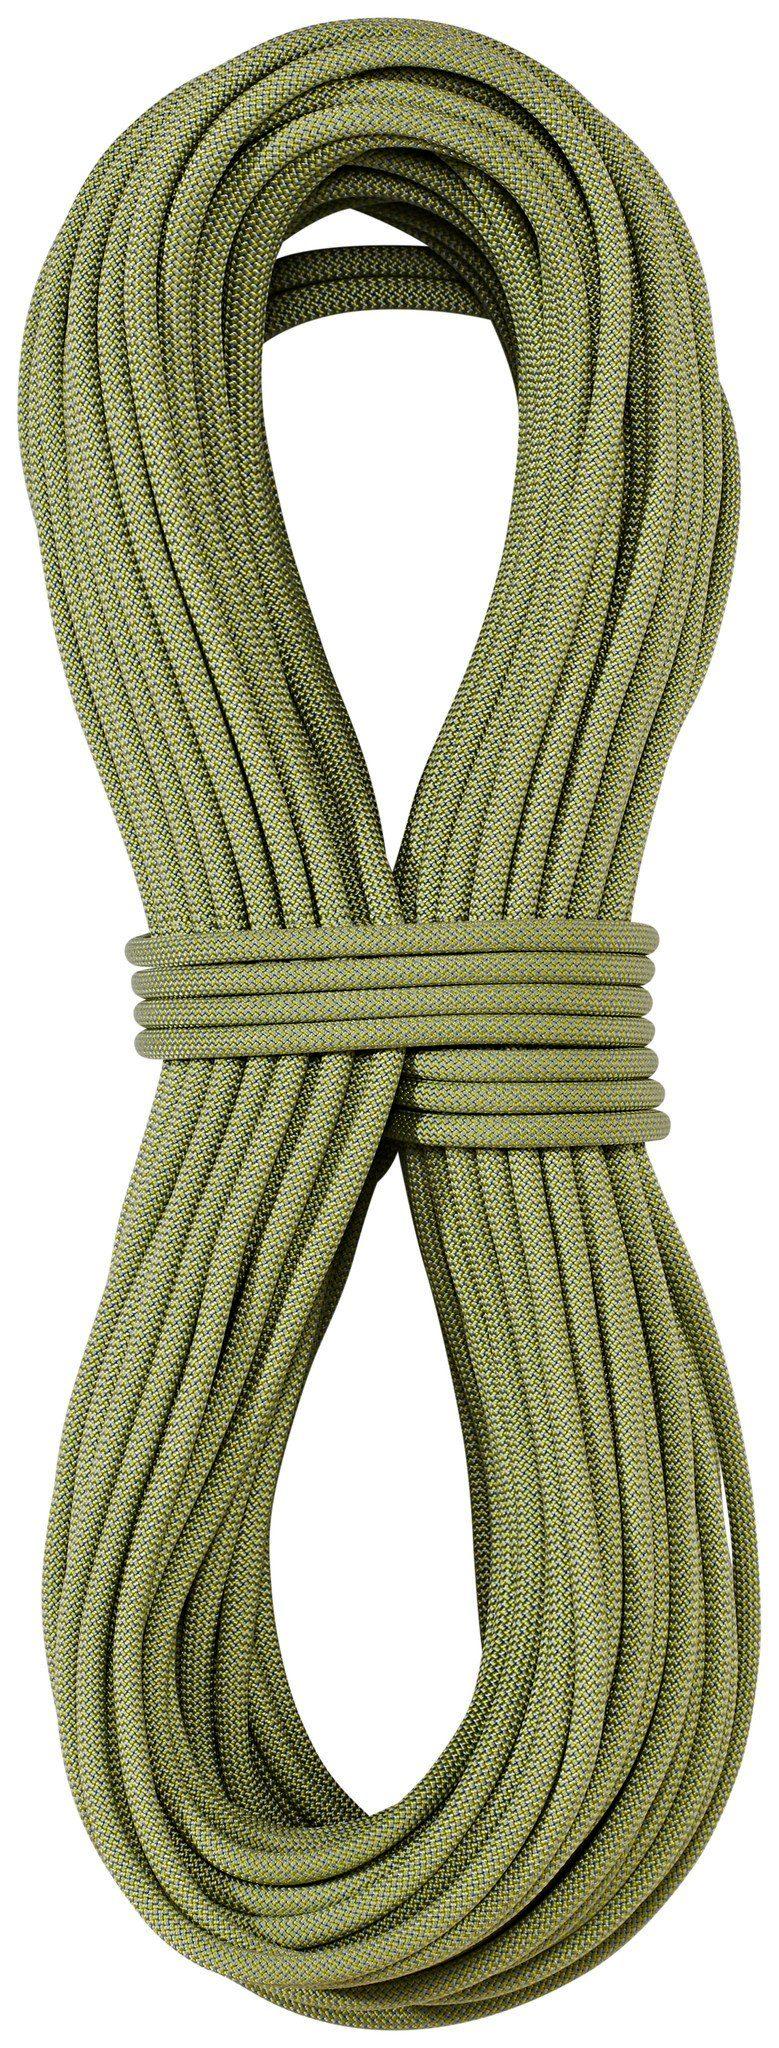 Edelrid Kletterseil »Skimmer Pro Dry Rope 7,1mm 70m«